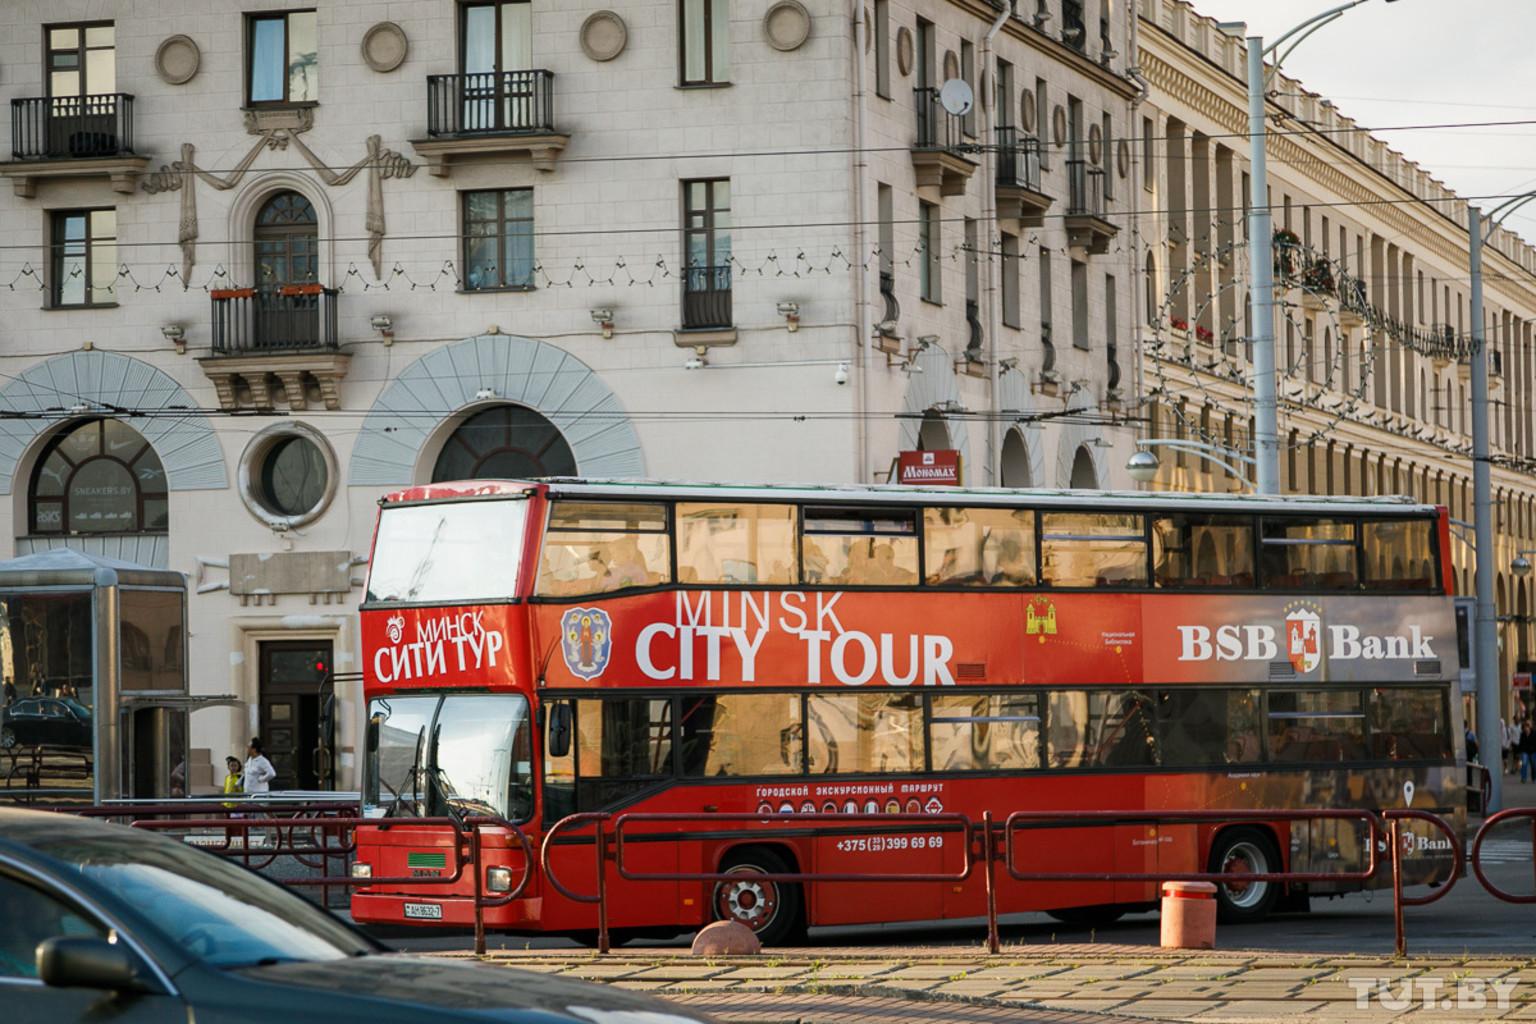 Turisticheskiy avtobus minsk city tour 20170726 shuk tutby phsl 5650